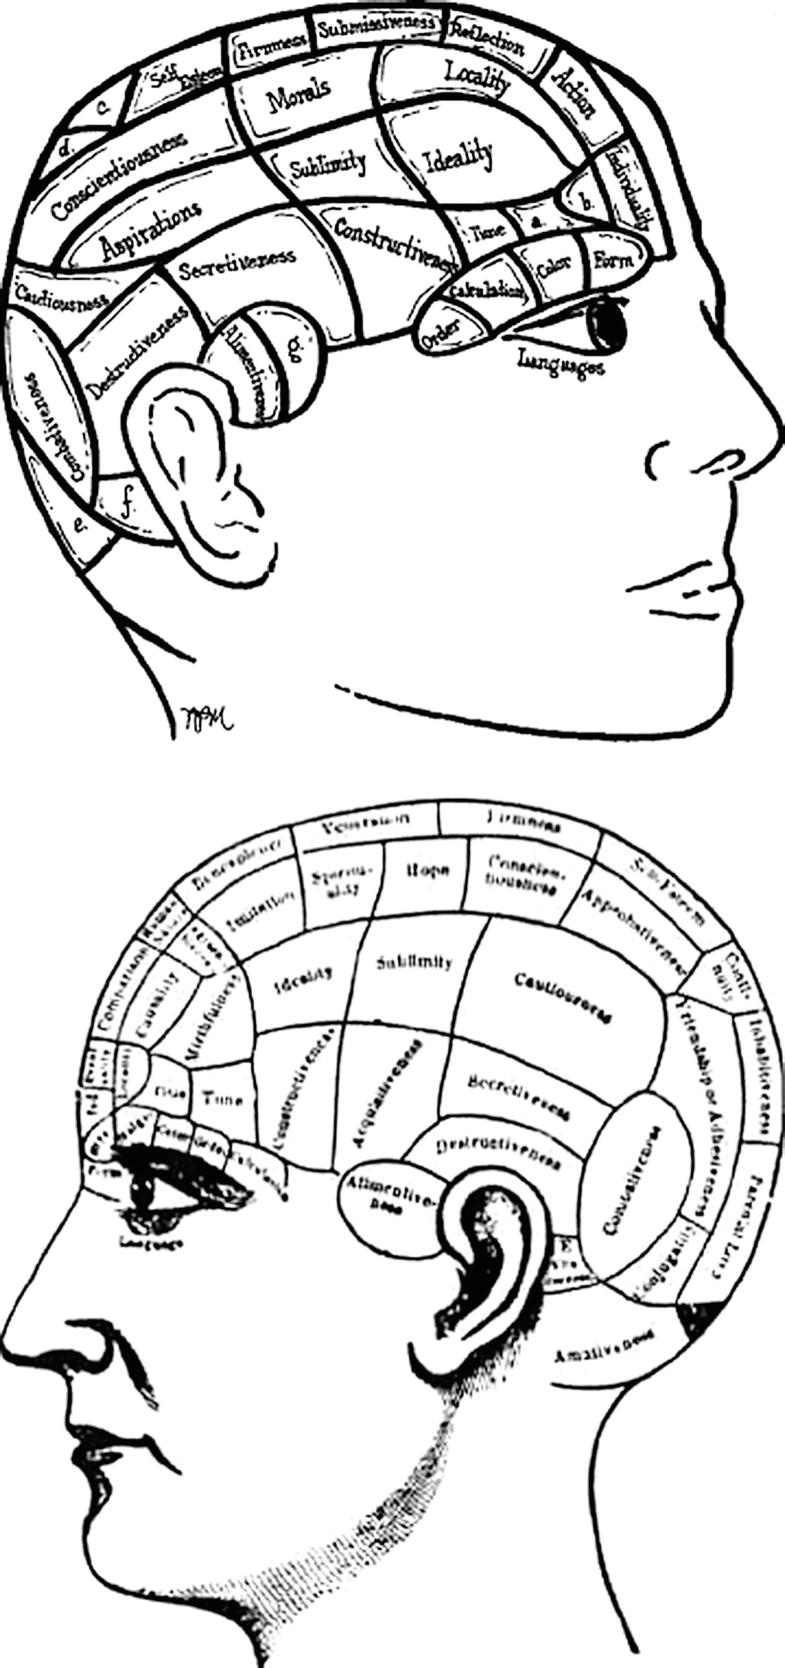 Phrenology, Fig. 1